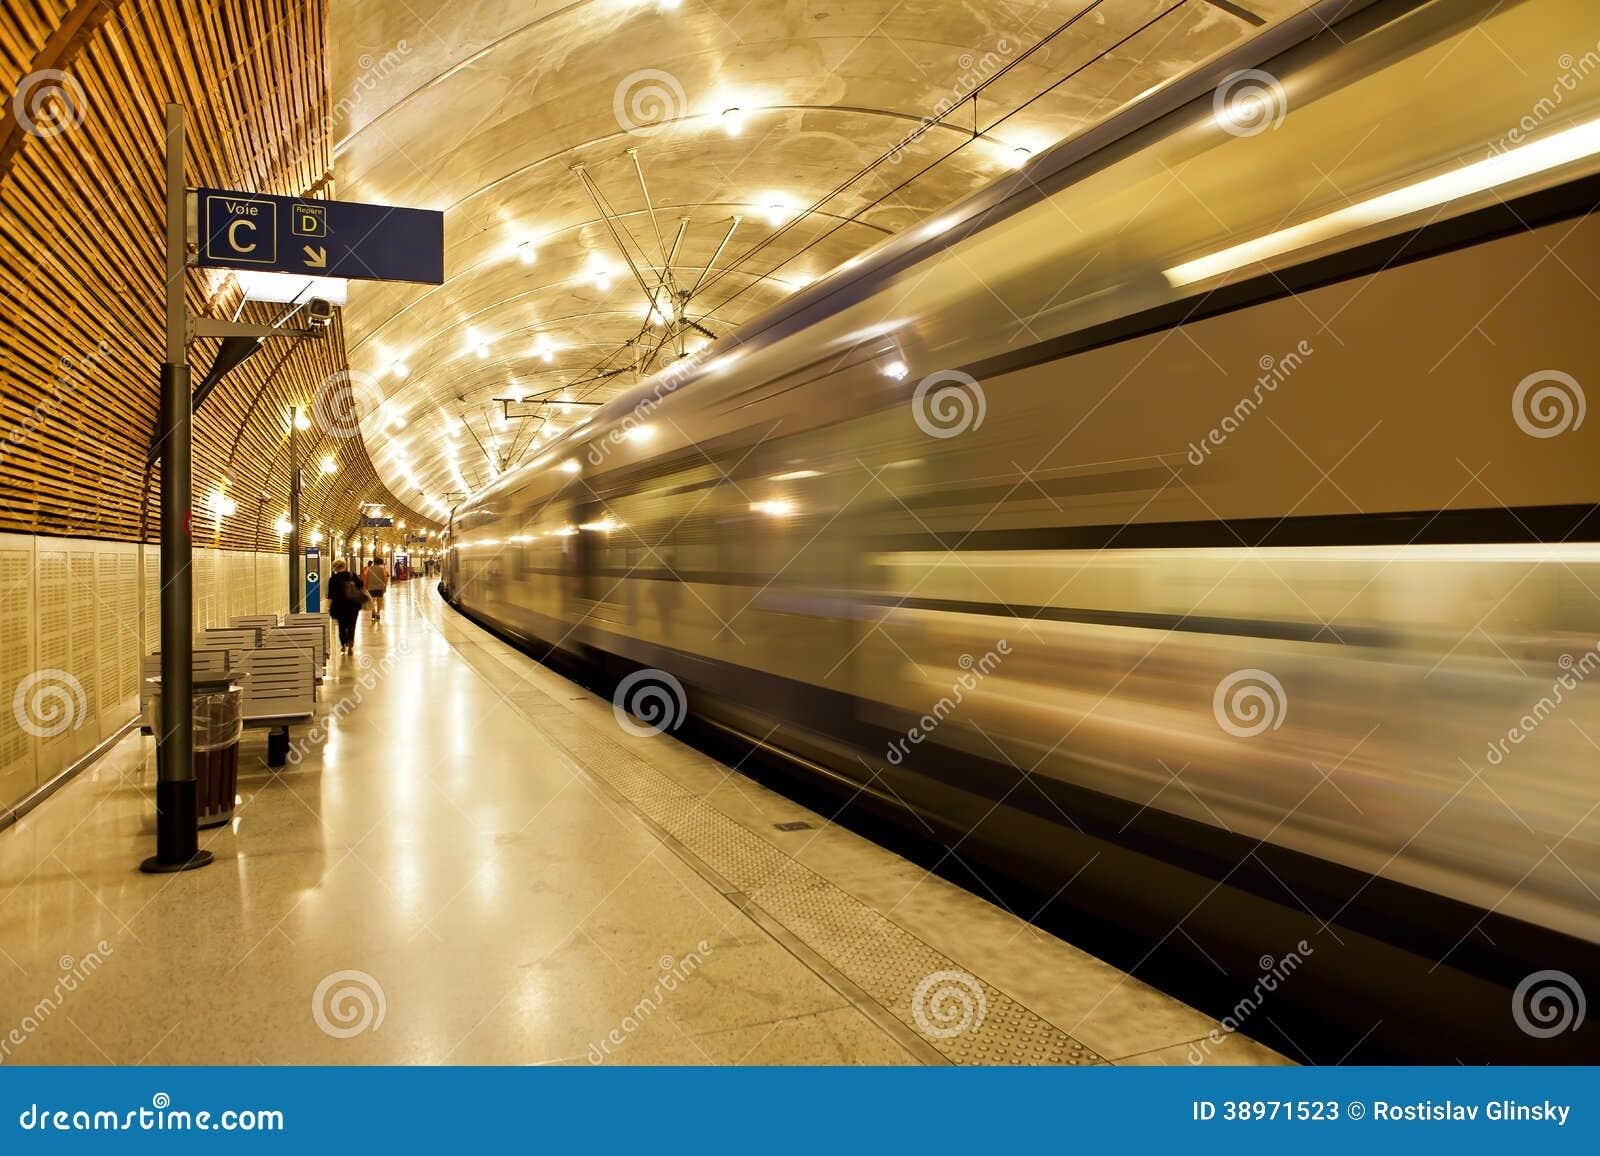 Underground Train Station In Monaco. Editorial Stock Photo - Image ...